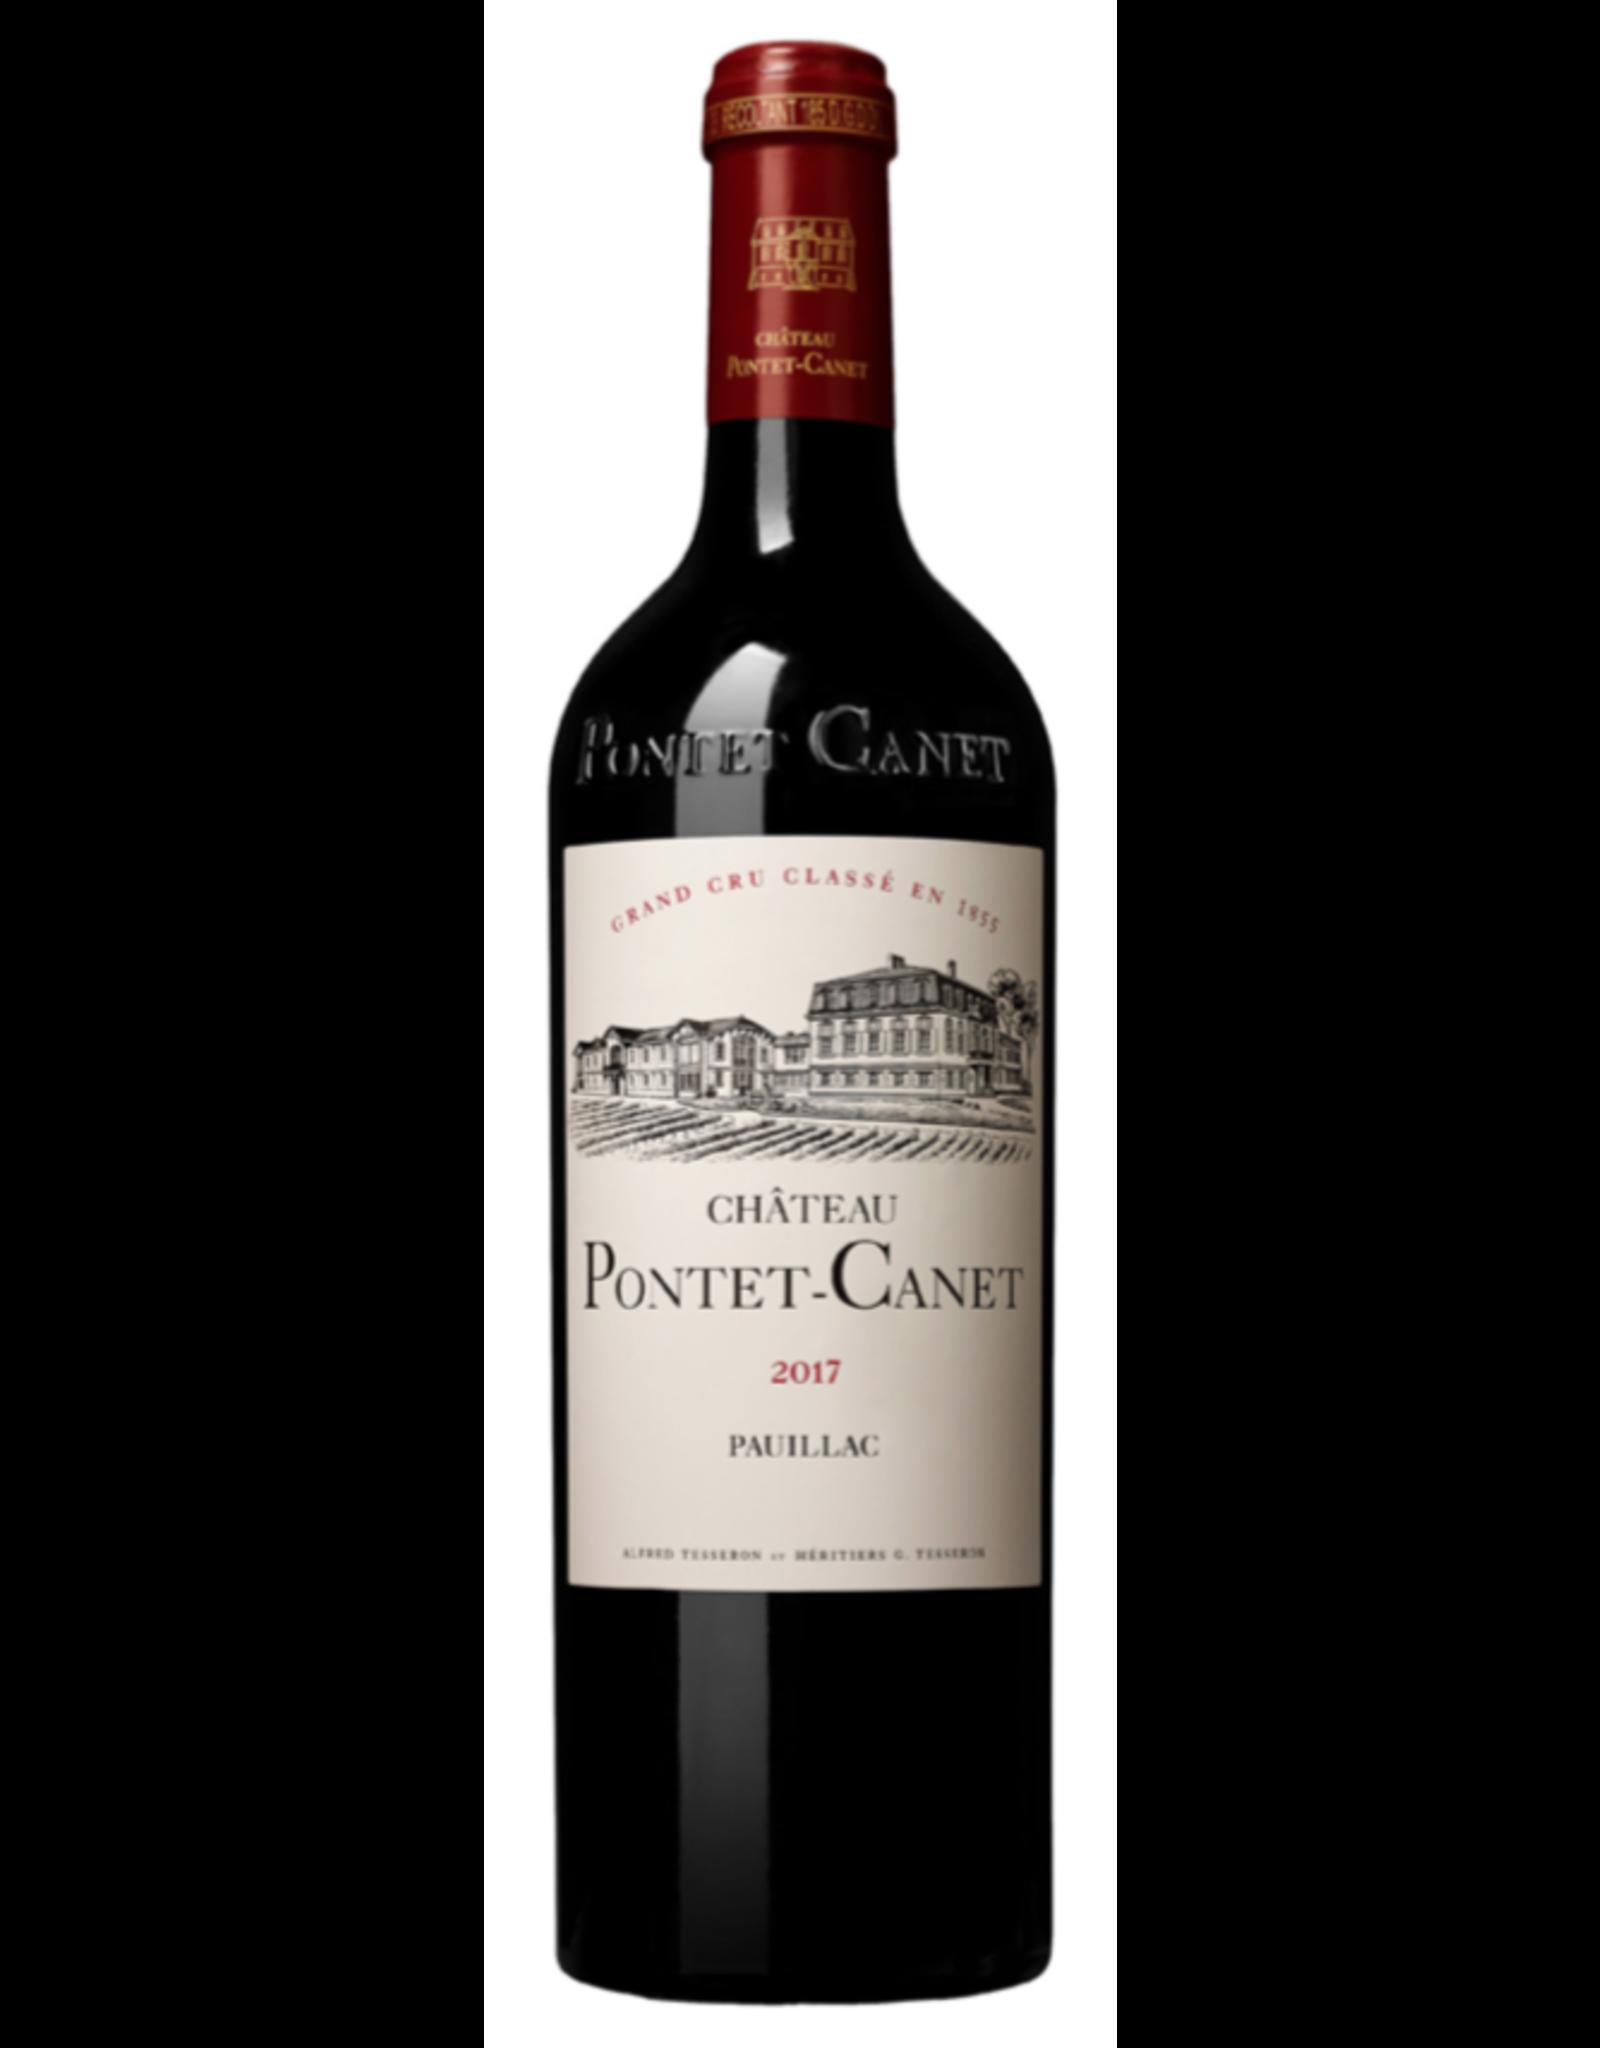 Château Pontet Canet Château Pontet Canet 2018 - Pauillac